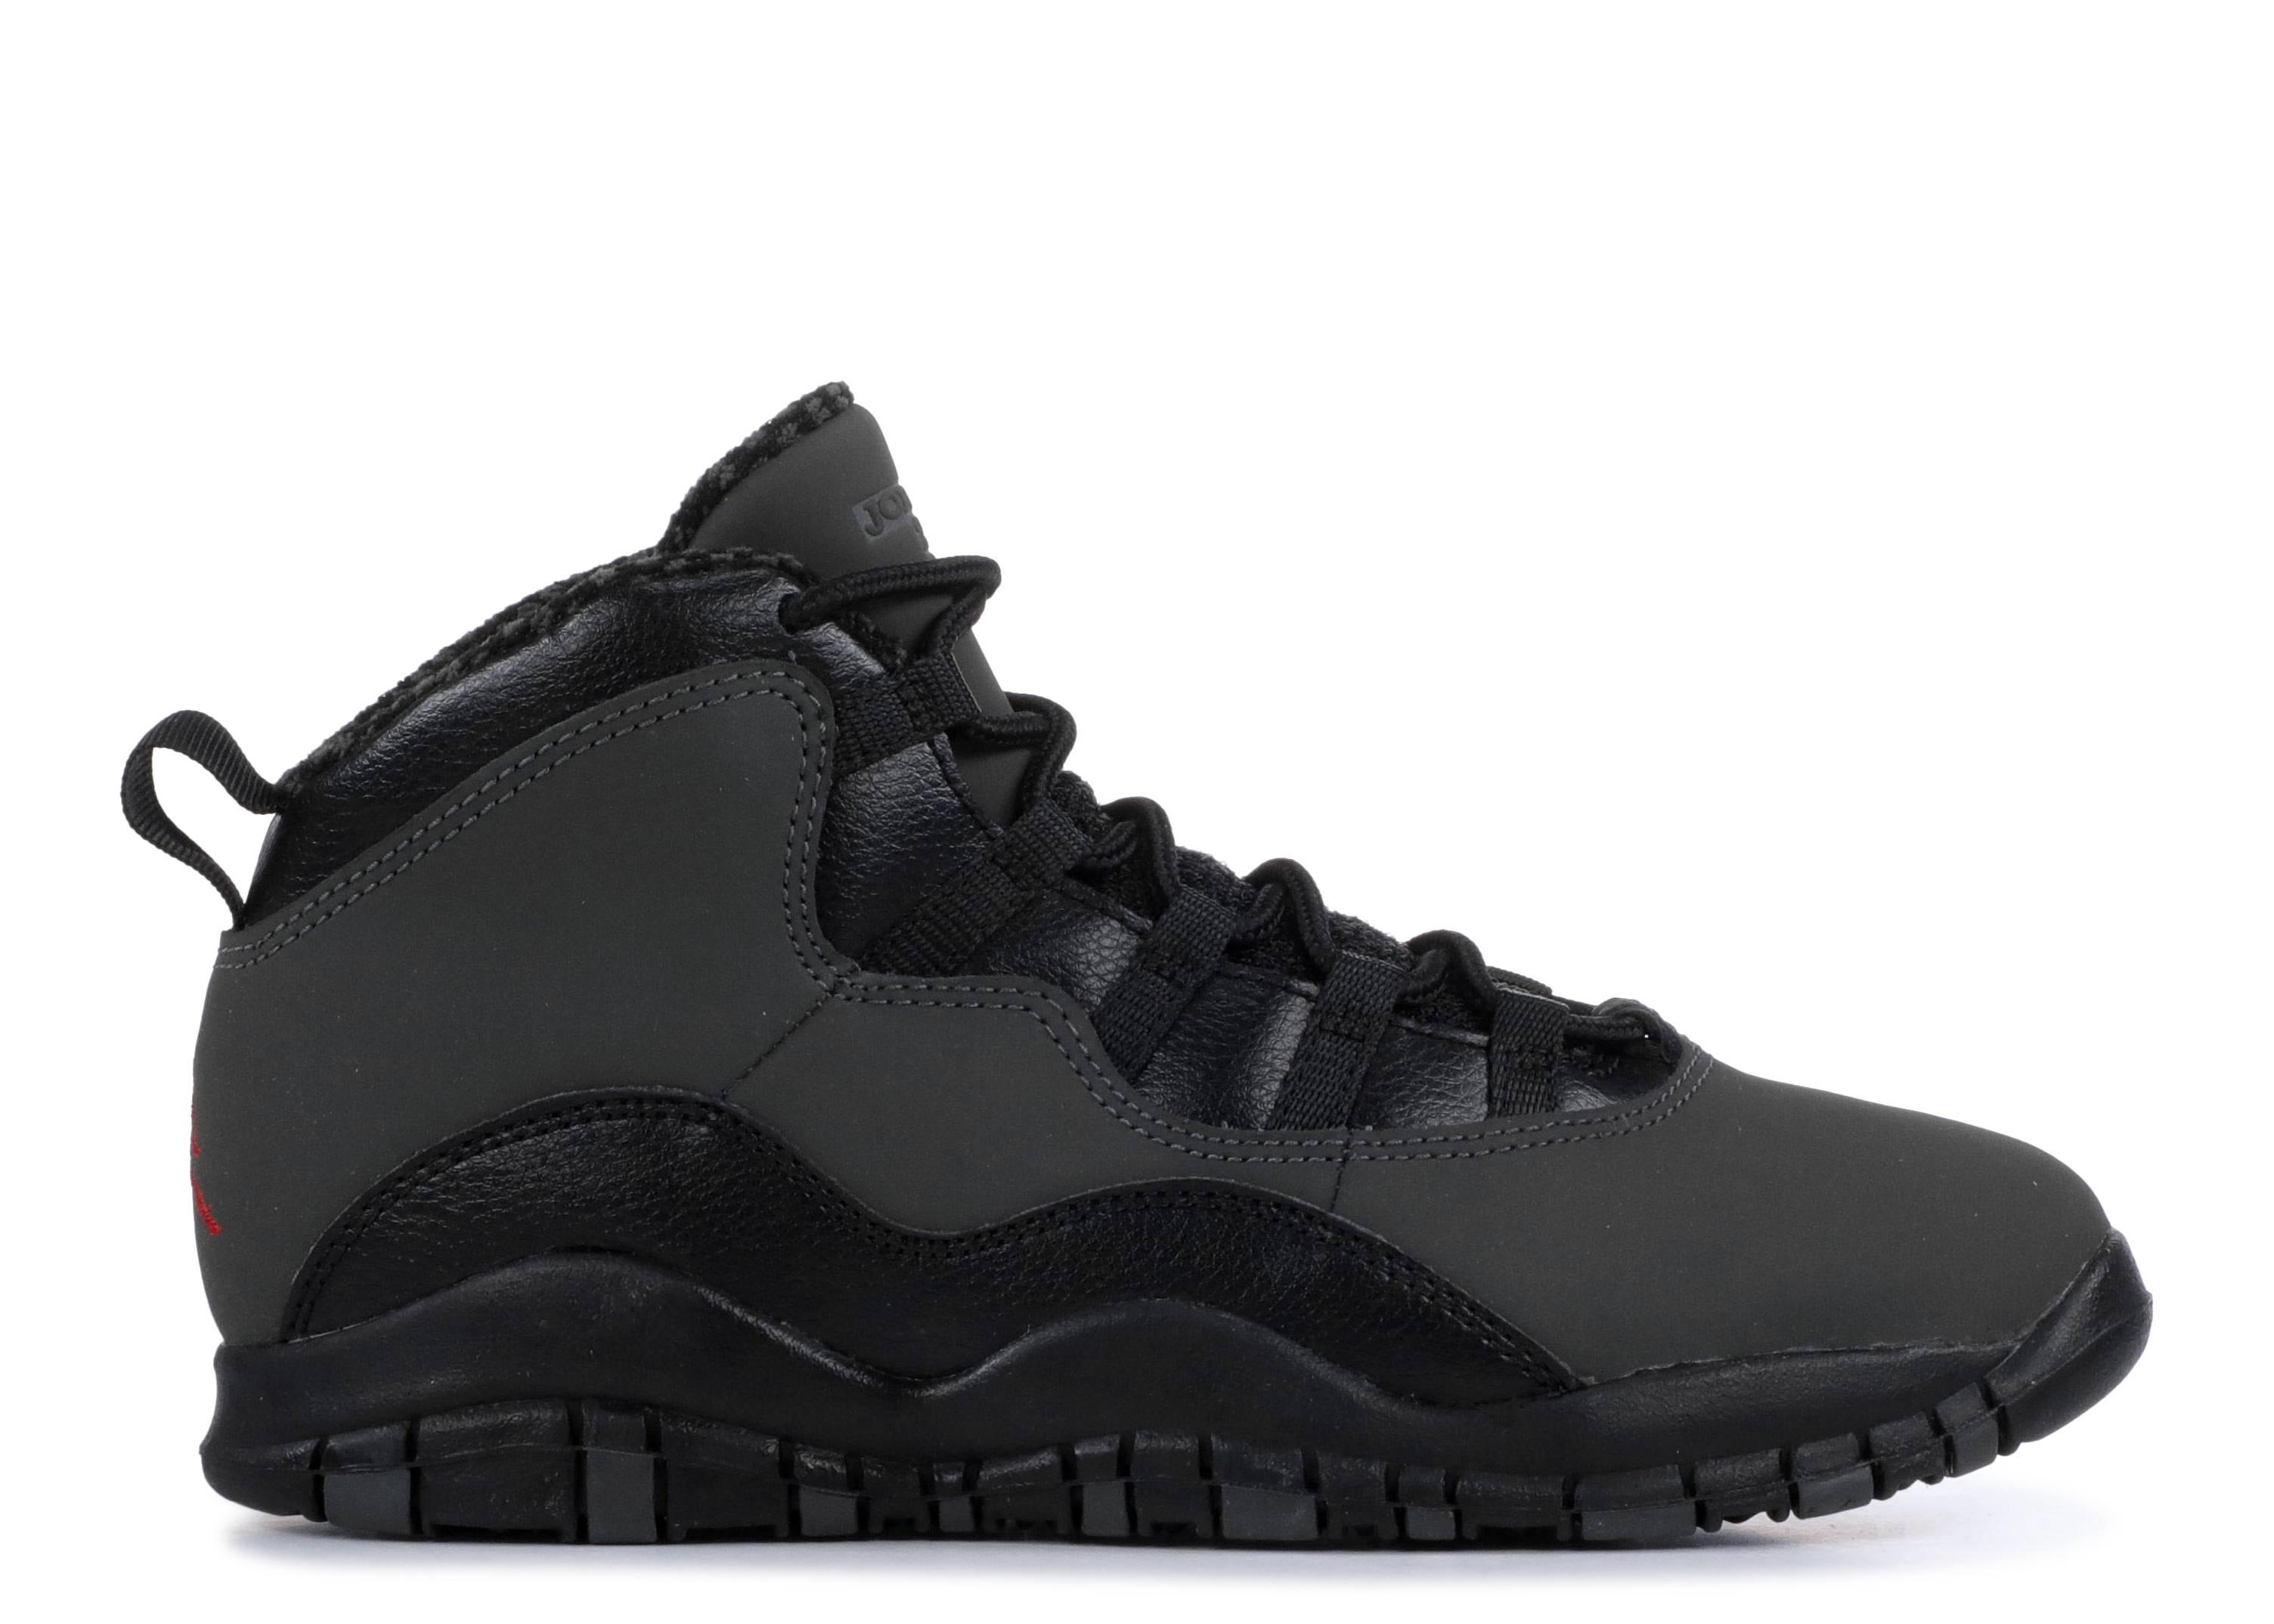 sports shoes 43d38 d84c0 Jordan Retro 10 - Air Jordan - 310807 002 - dark shadow true red ...